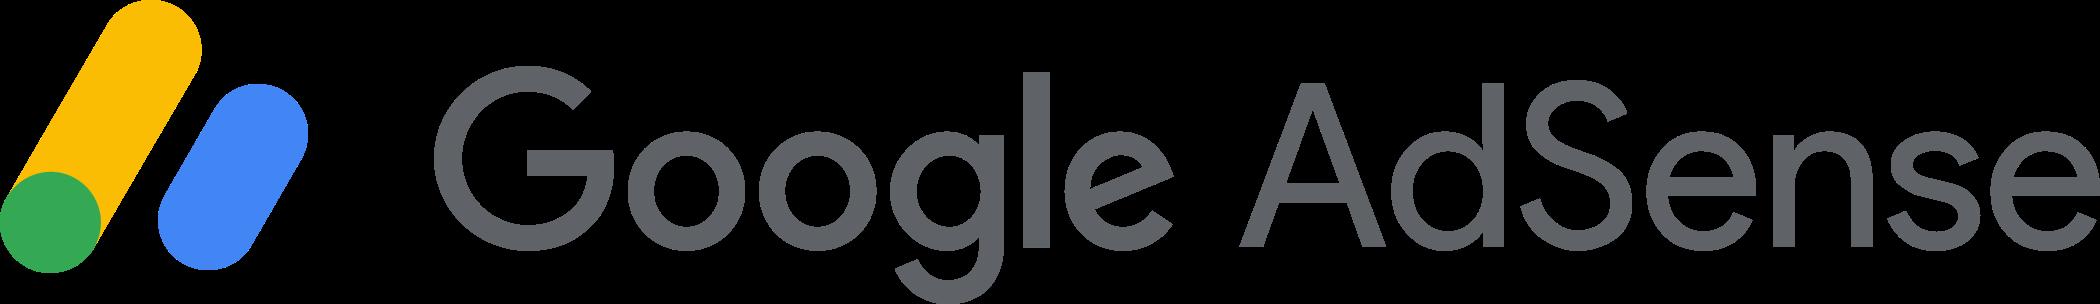 google-adsense-logo-1